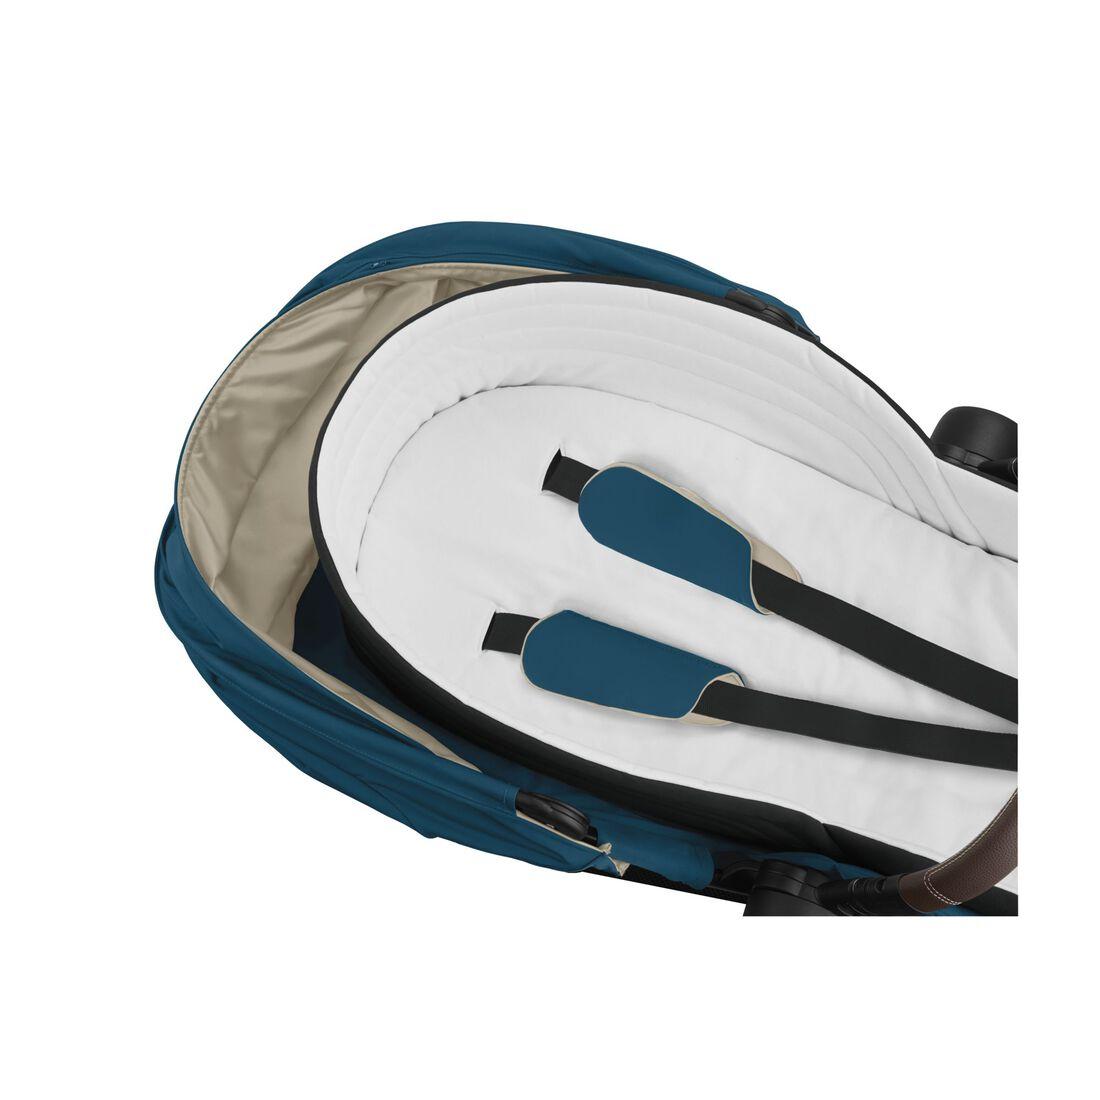 CYBEX Lite Cot - Mountain Blue in Mountain Blue large Bild 2